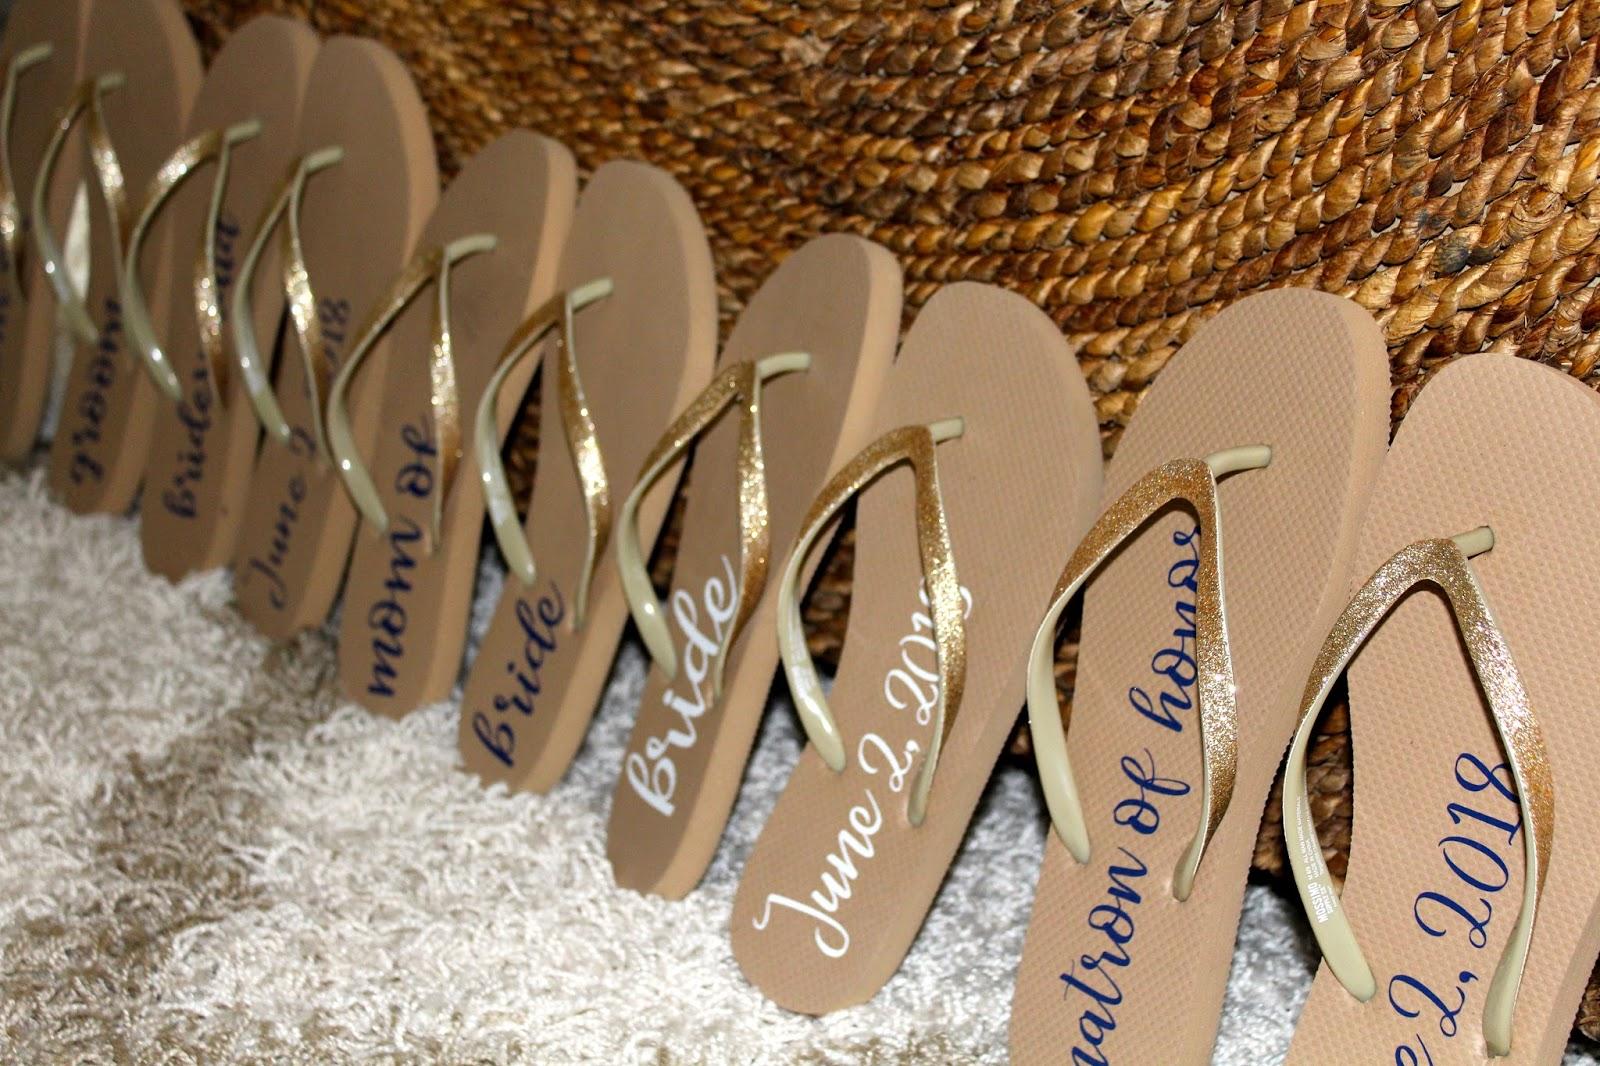 e66d8820e03f Flip Flops  Target    Acrylic Champagne Glasses  World Market    Pineapple  Cards  Target